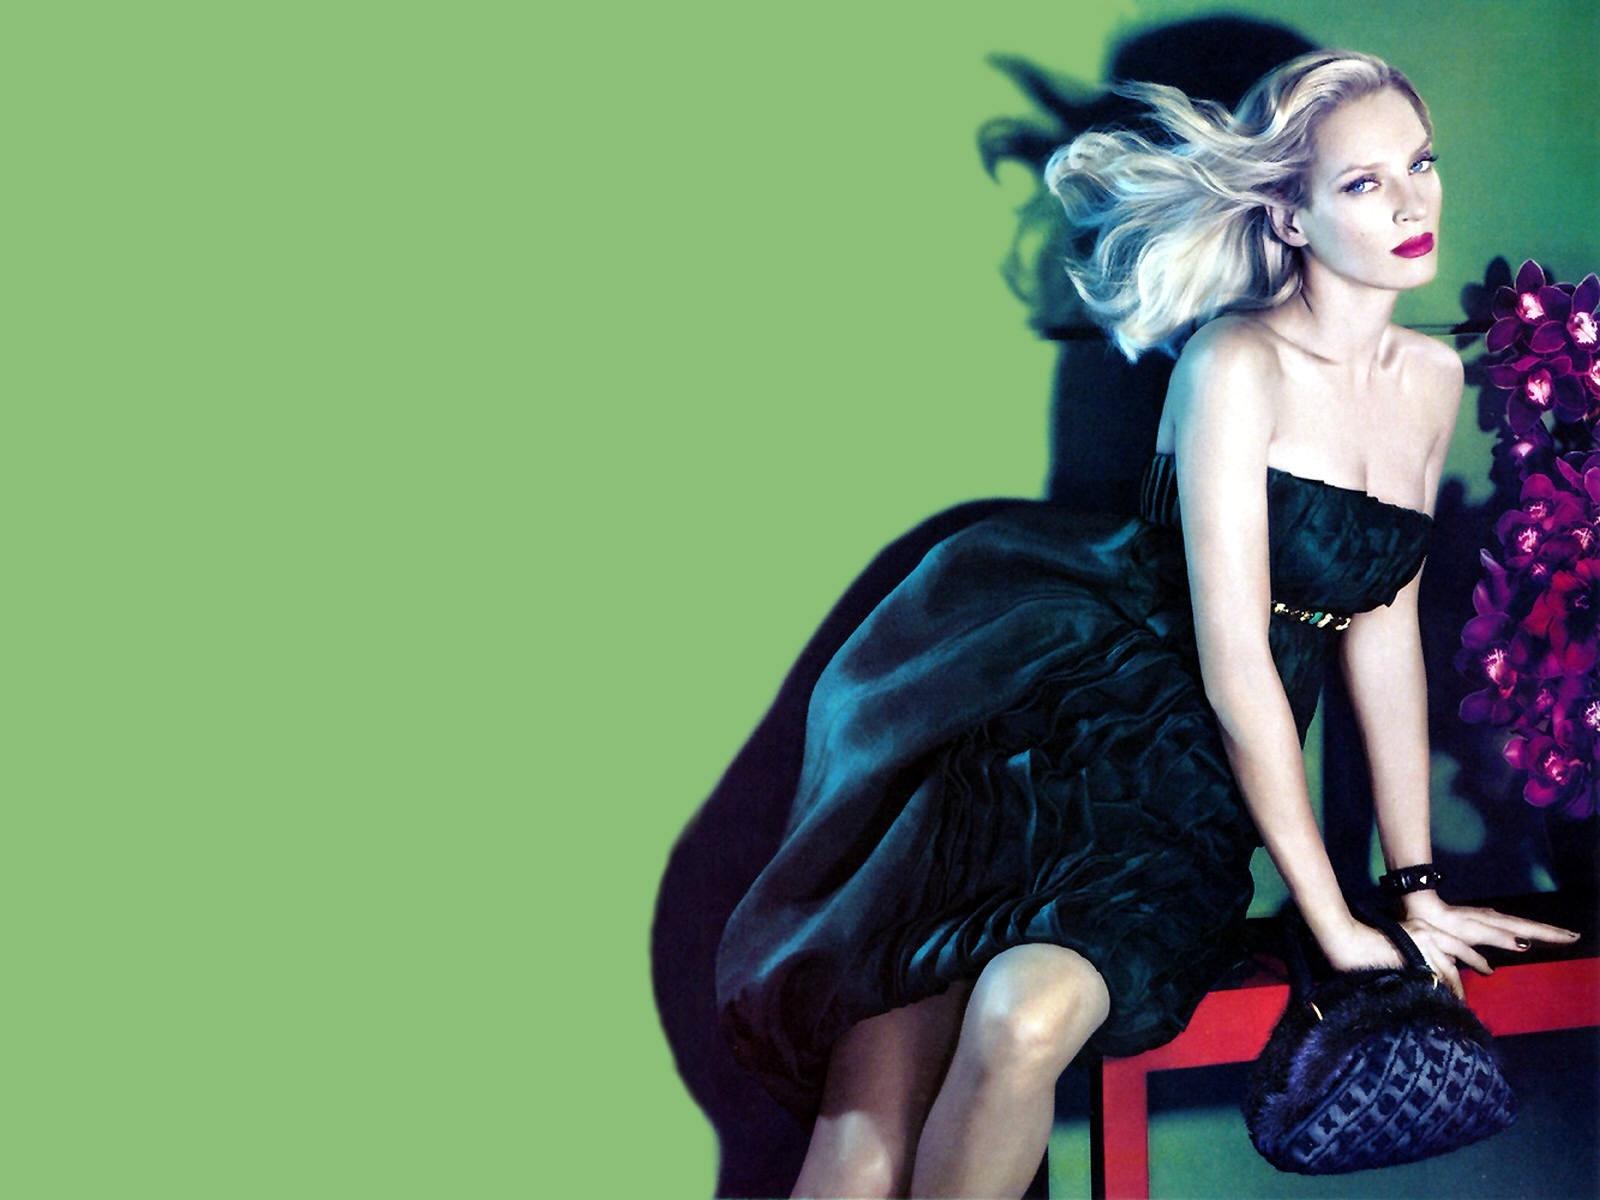 Wallpaper di Uma Thurman in versione super glamour